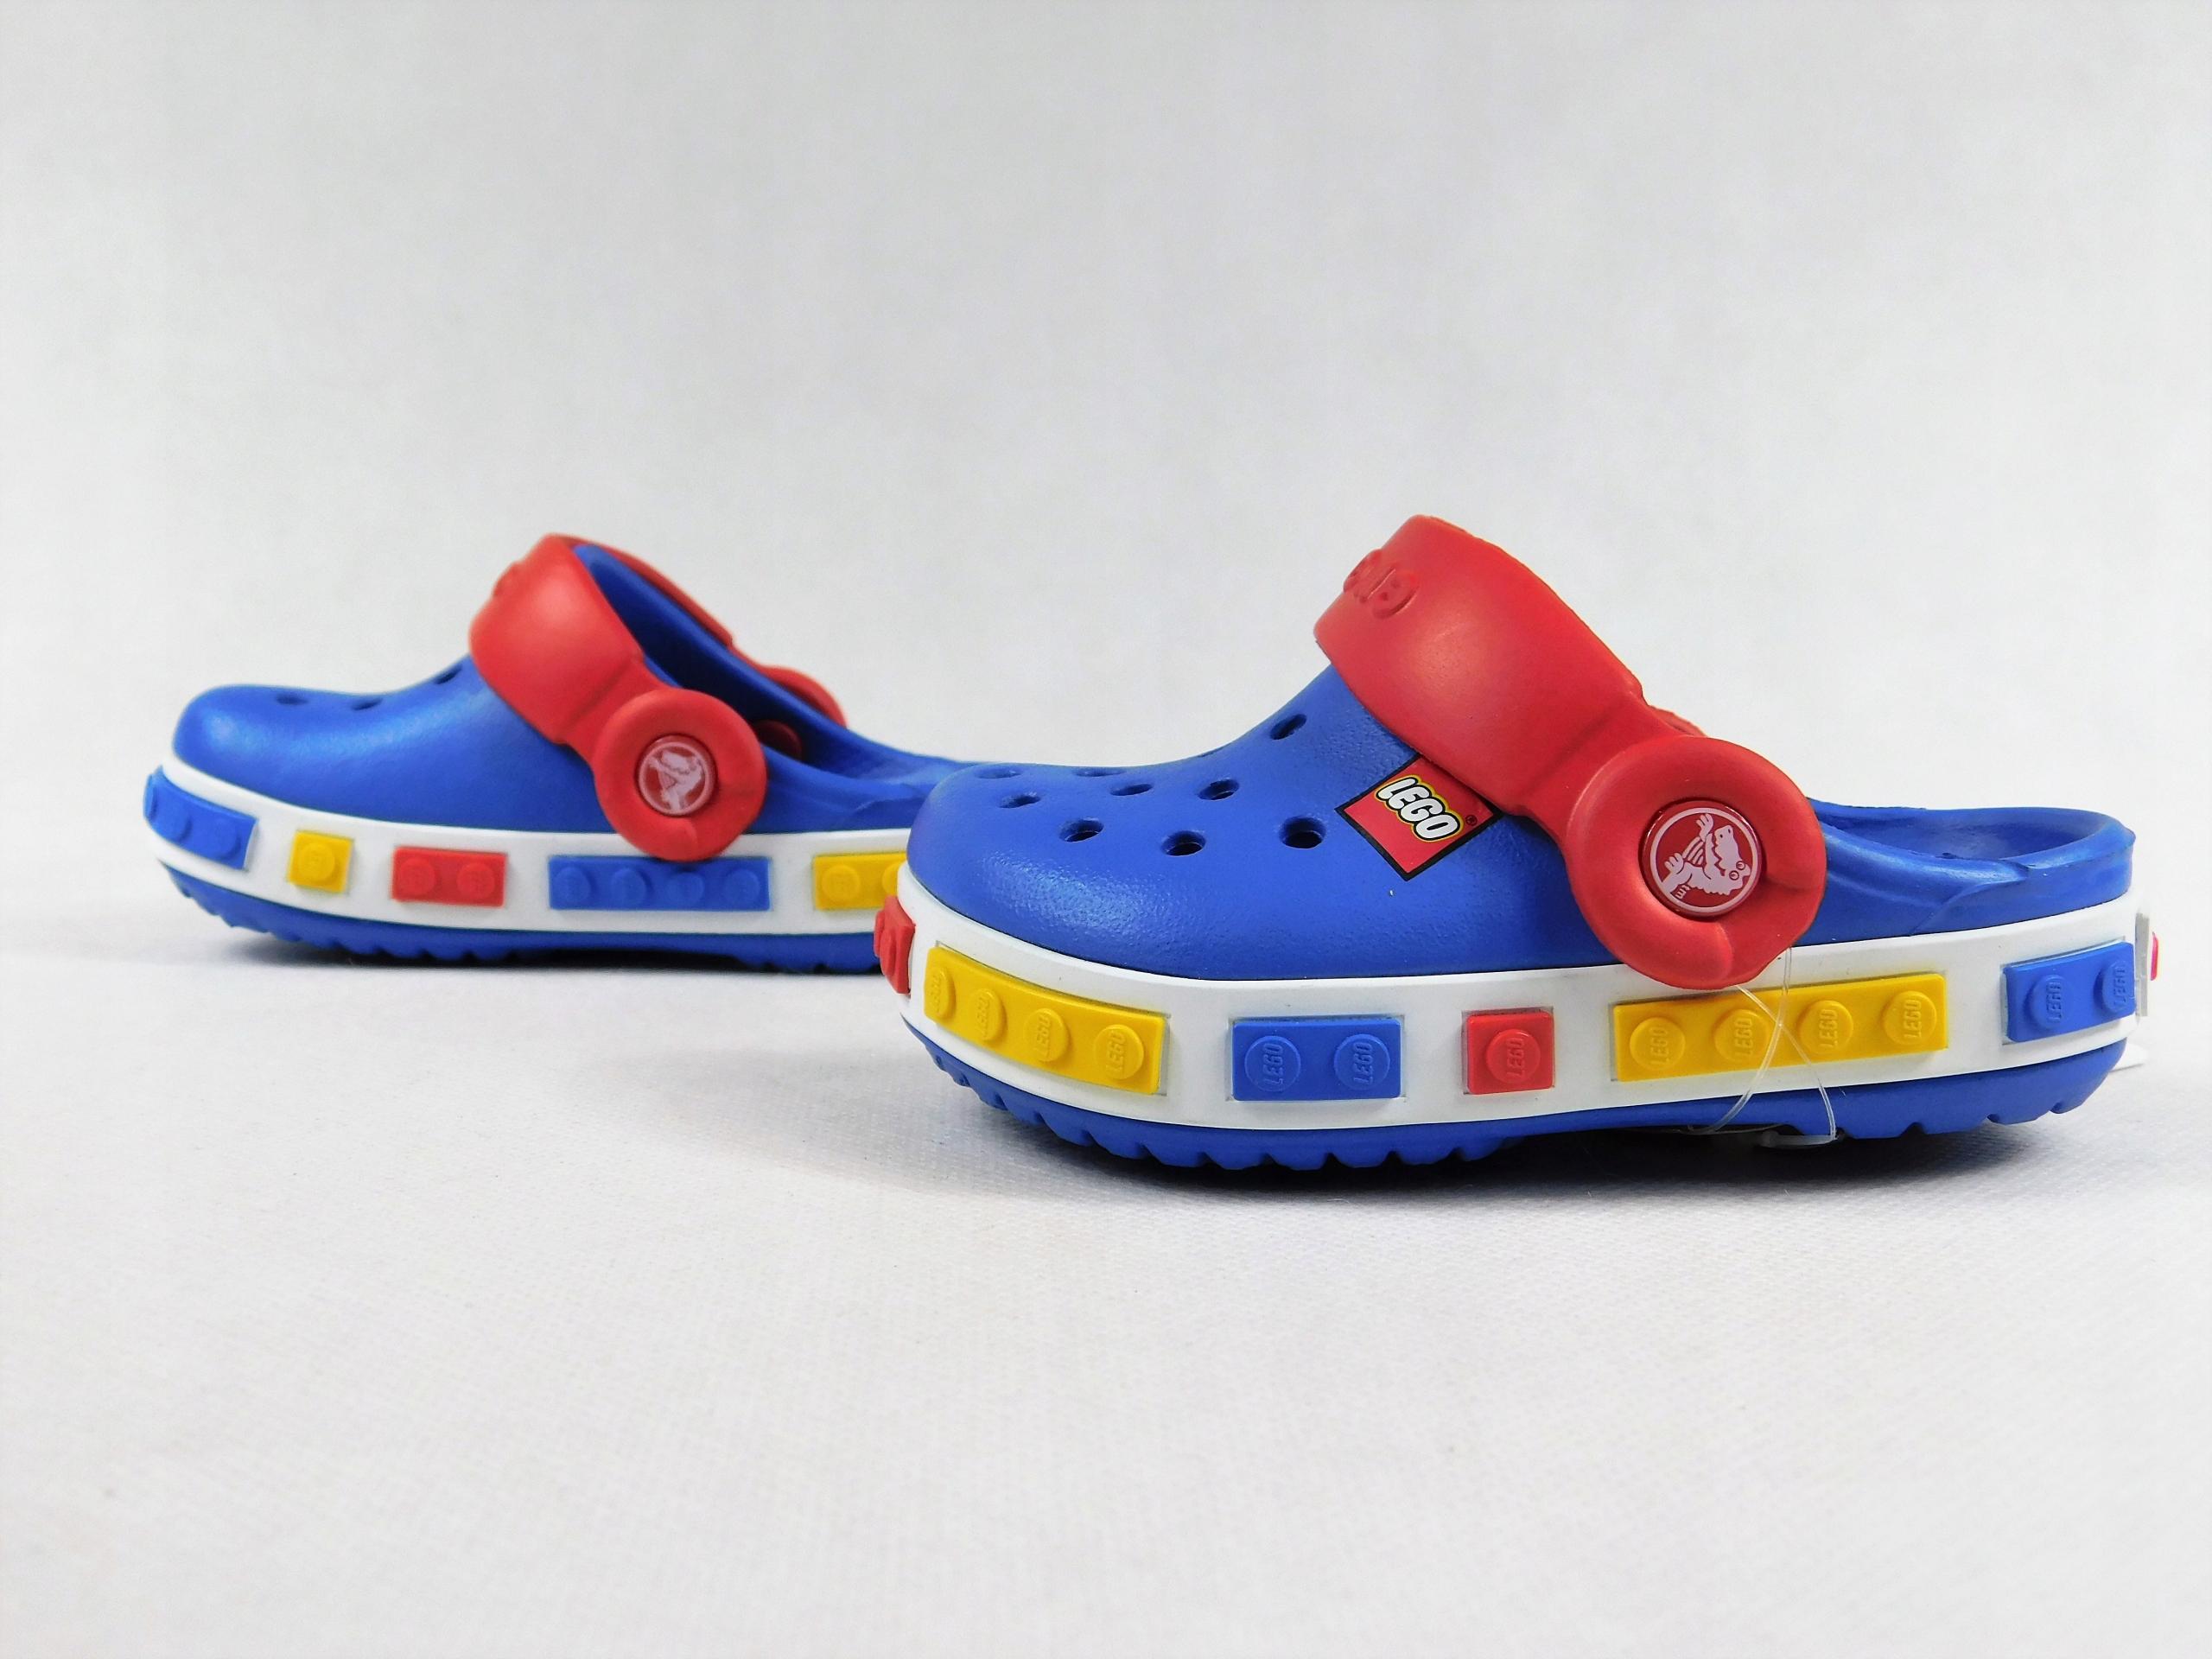 crocs c4/5 19-21 crocband kids Lego